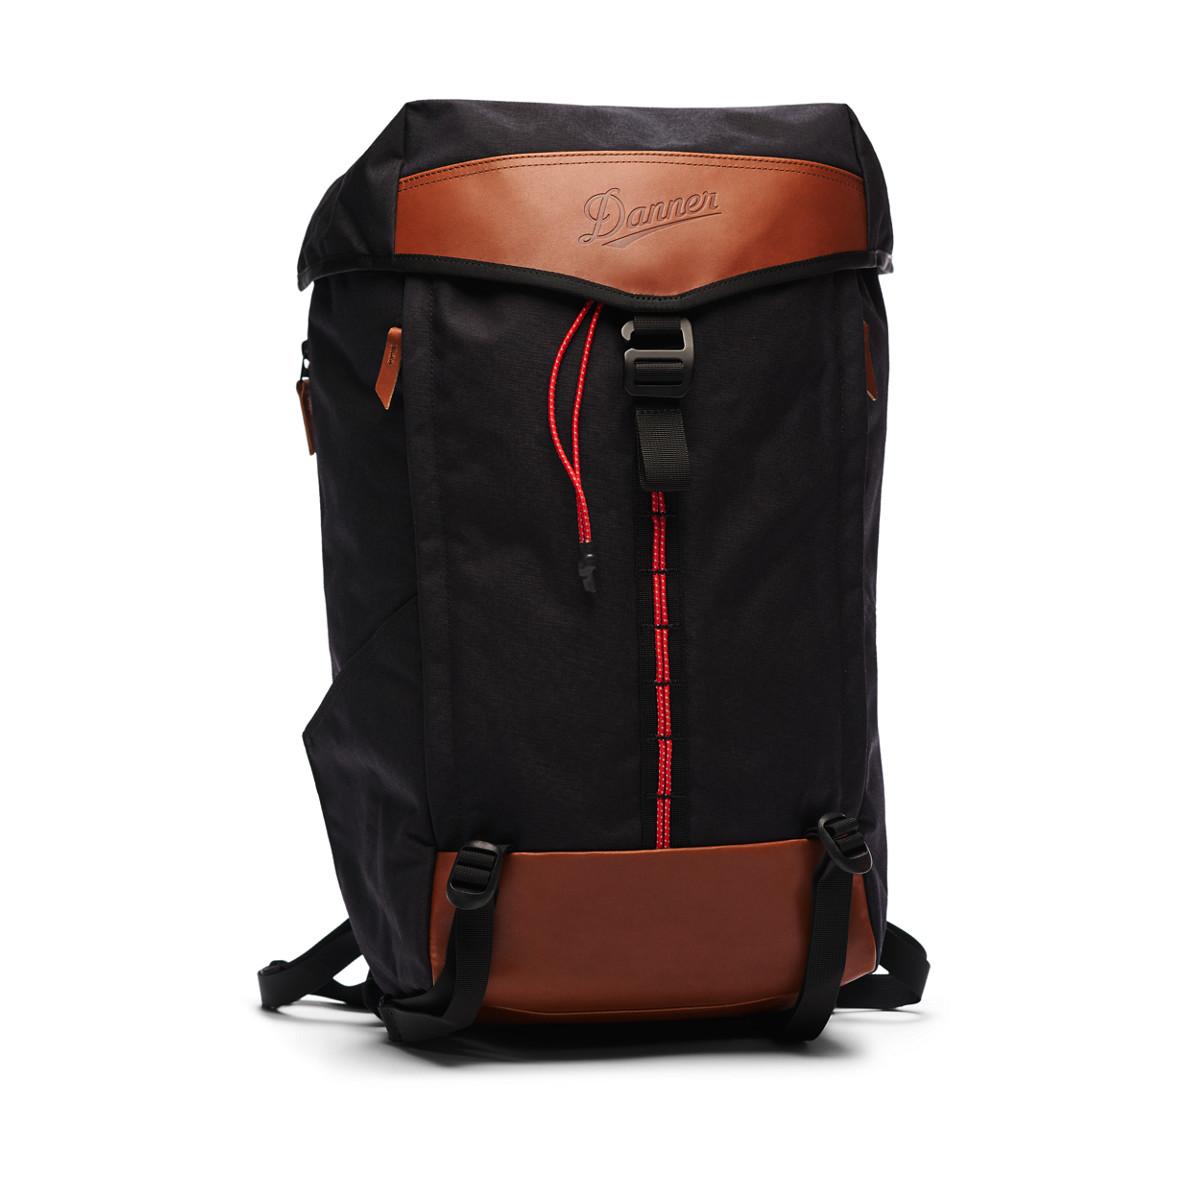 26L Daypack